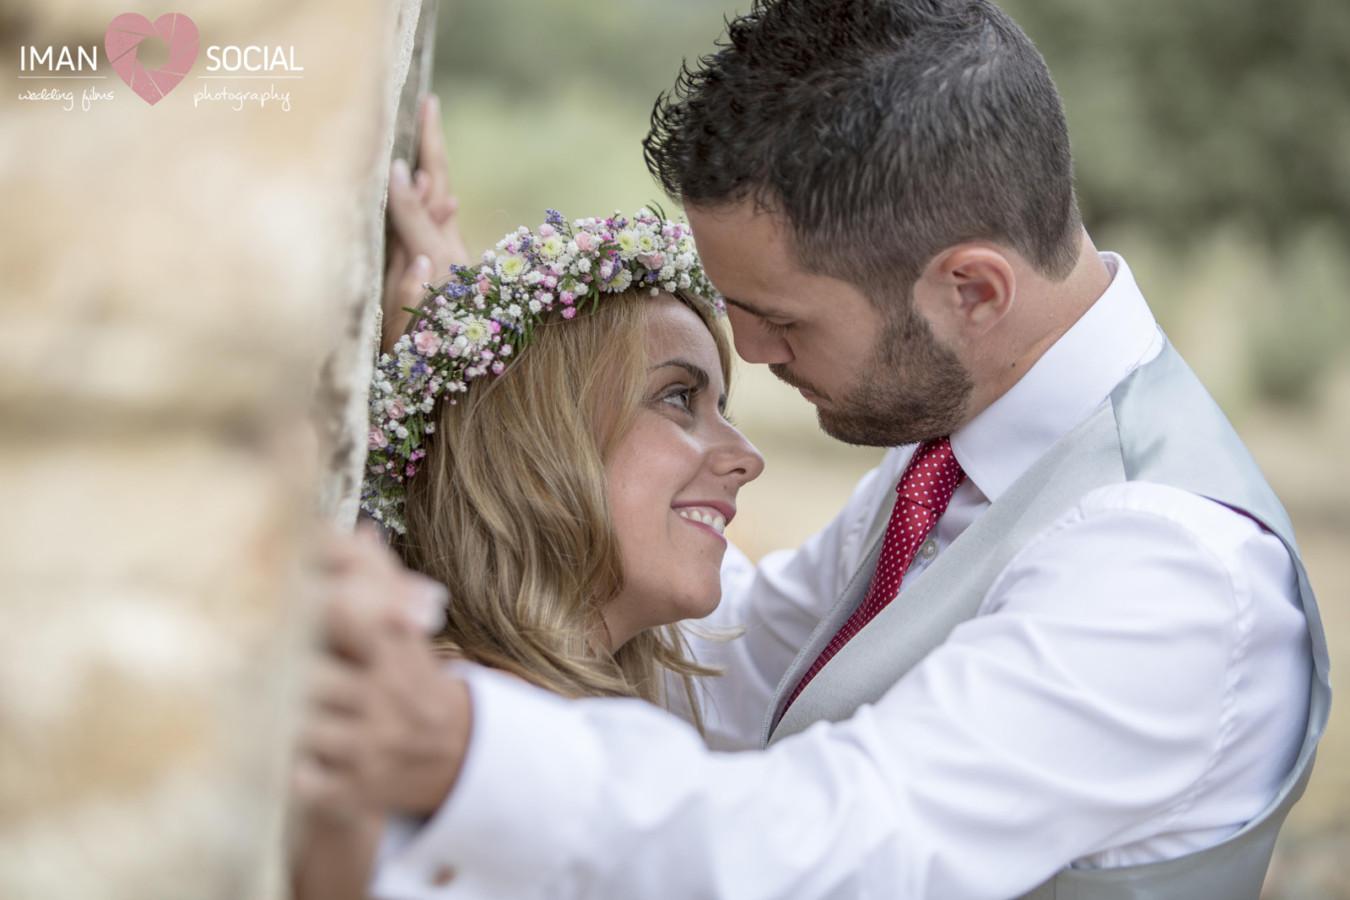 77B0227 Juan Antonio y Mónica - Postboda - video boda cordoba